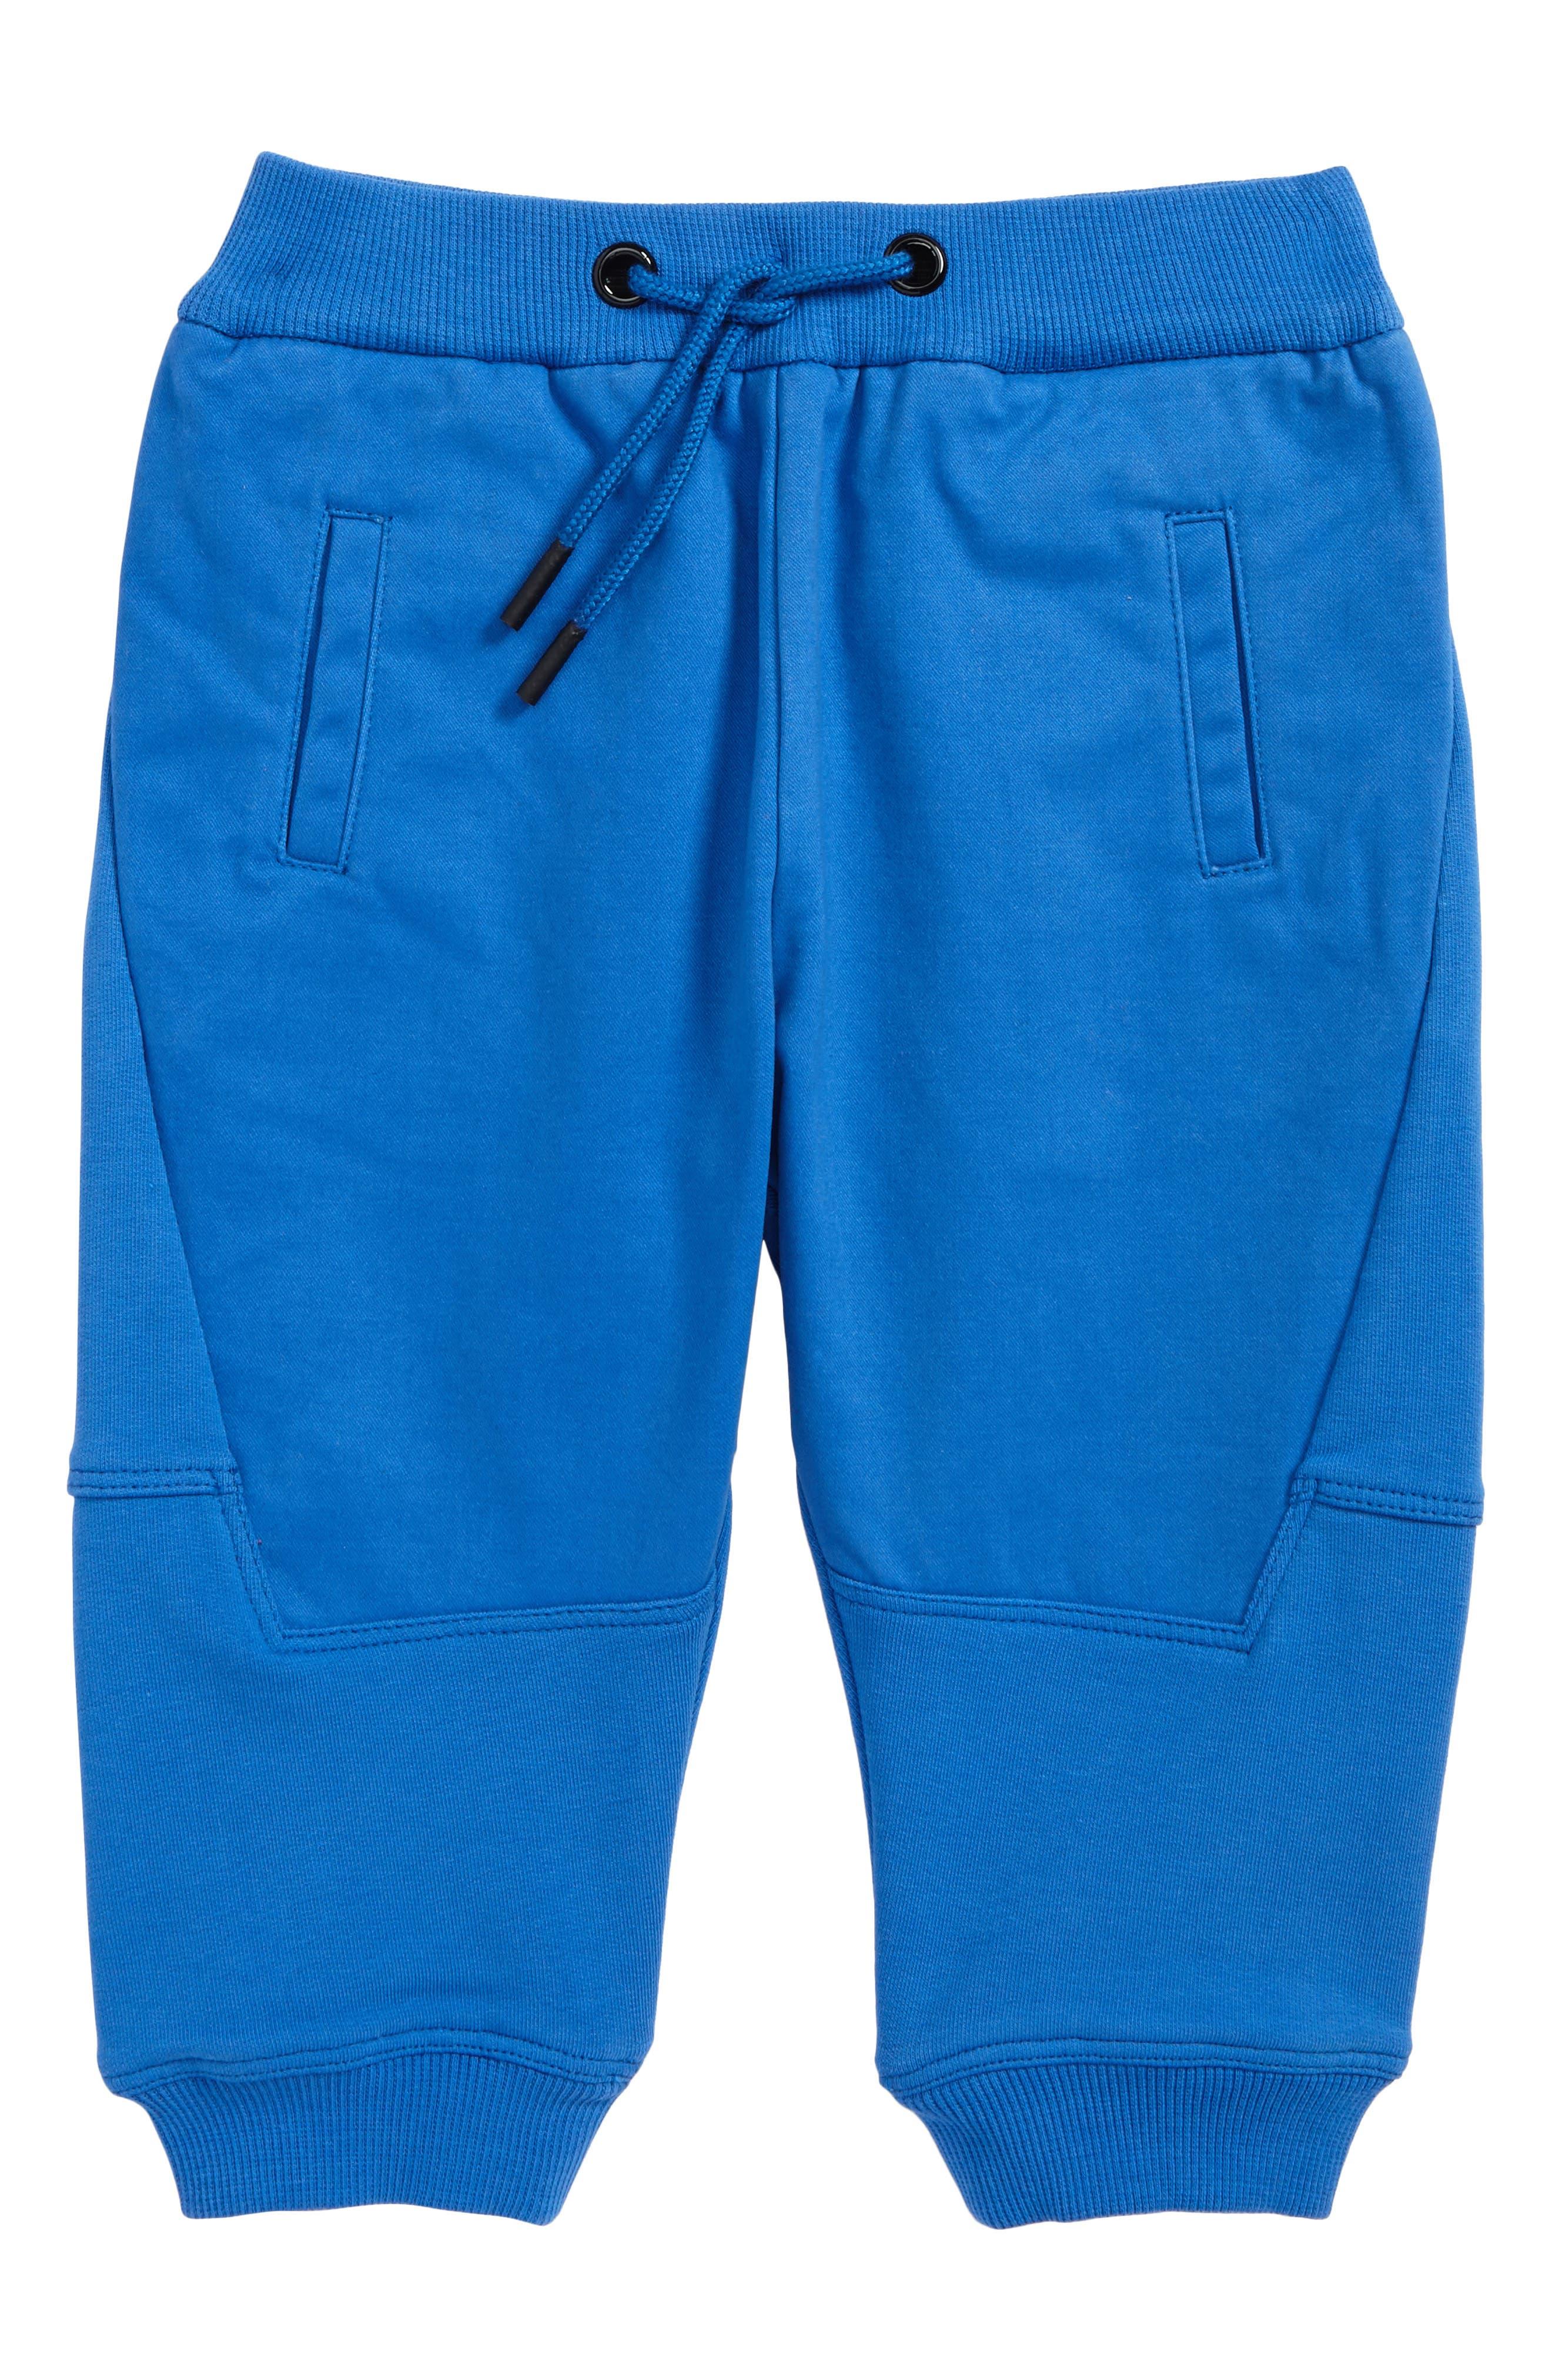 Jogger Pants,                         Main,                         color, Royal Blue